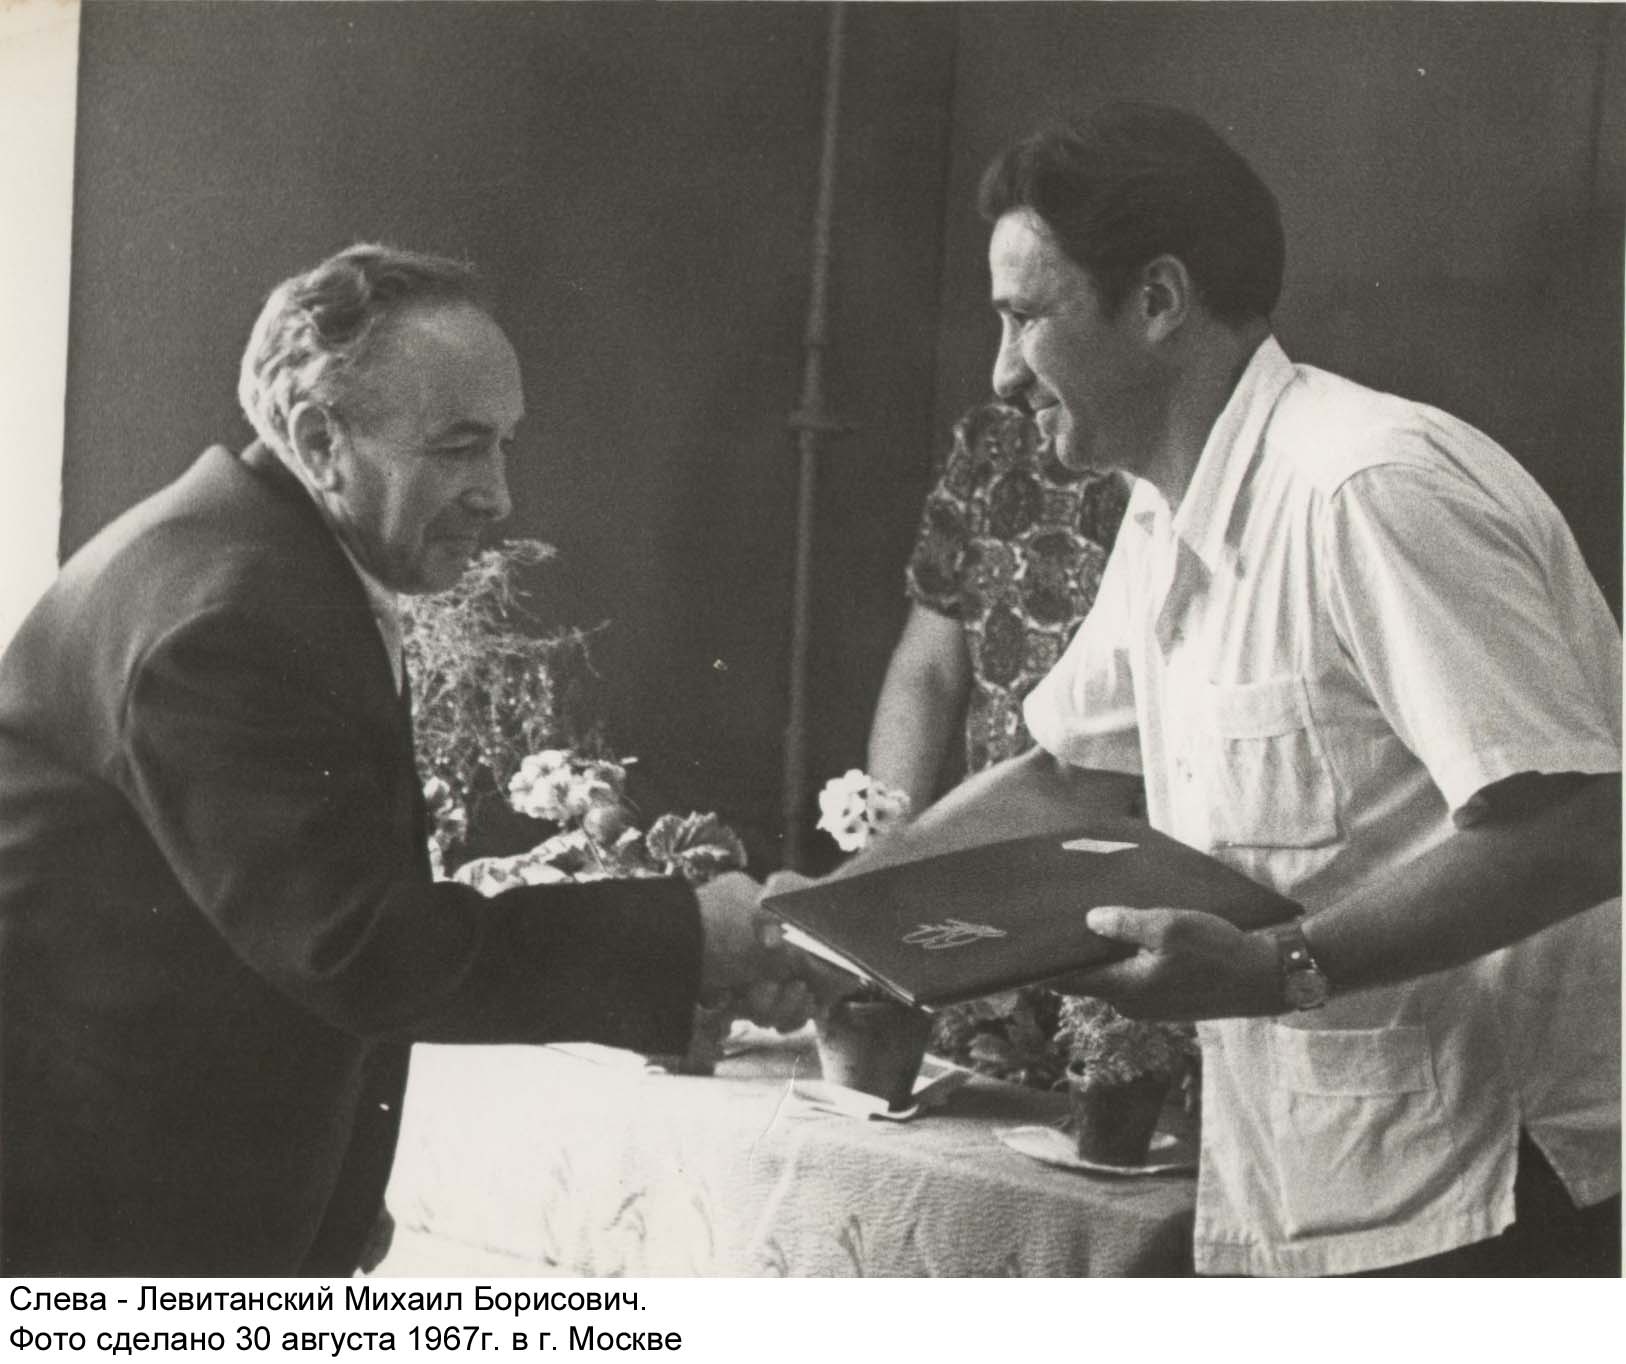 Слева — Левитанский Михаил Борисович. Фото сделано 30 августа 1967 г. на его 60-летнем юбилее в Москве